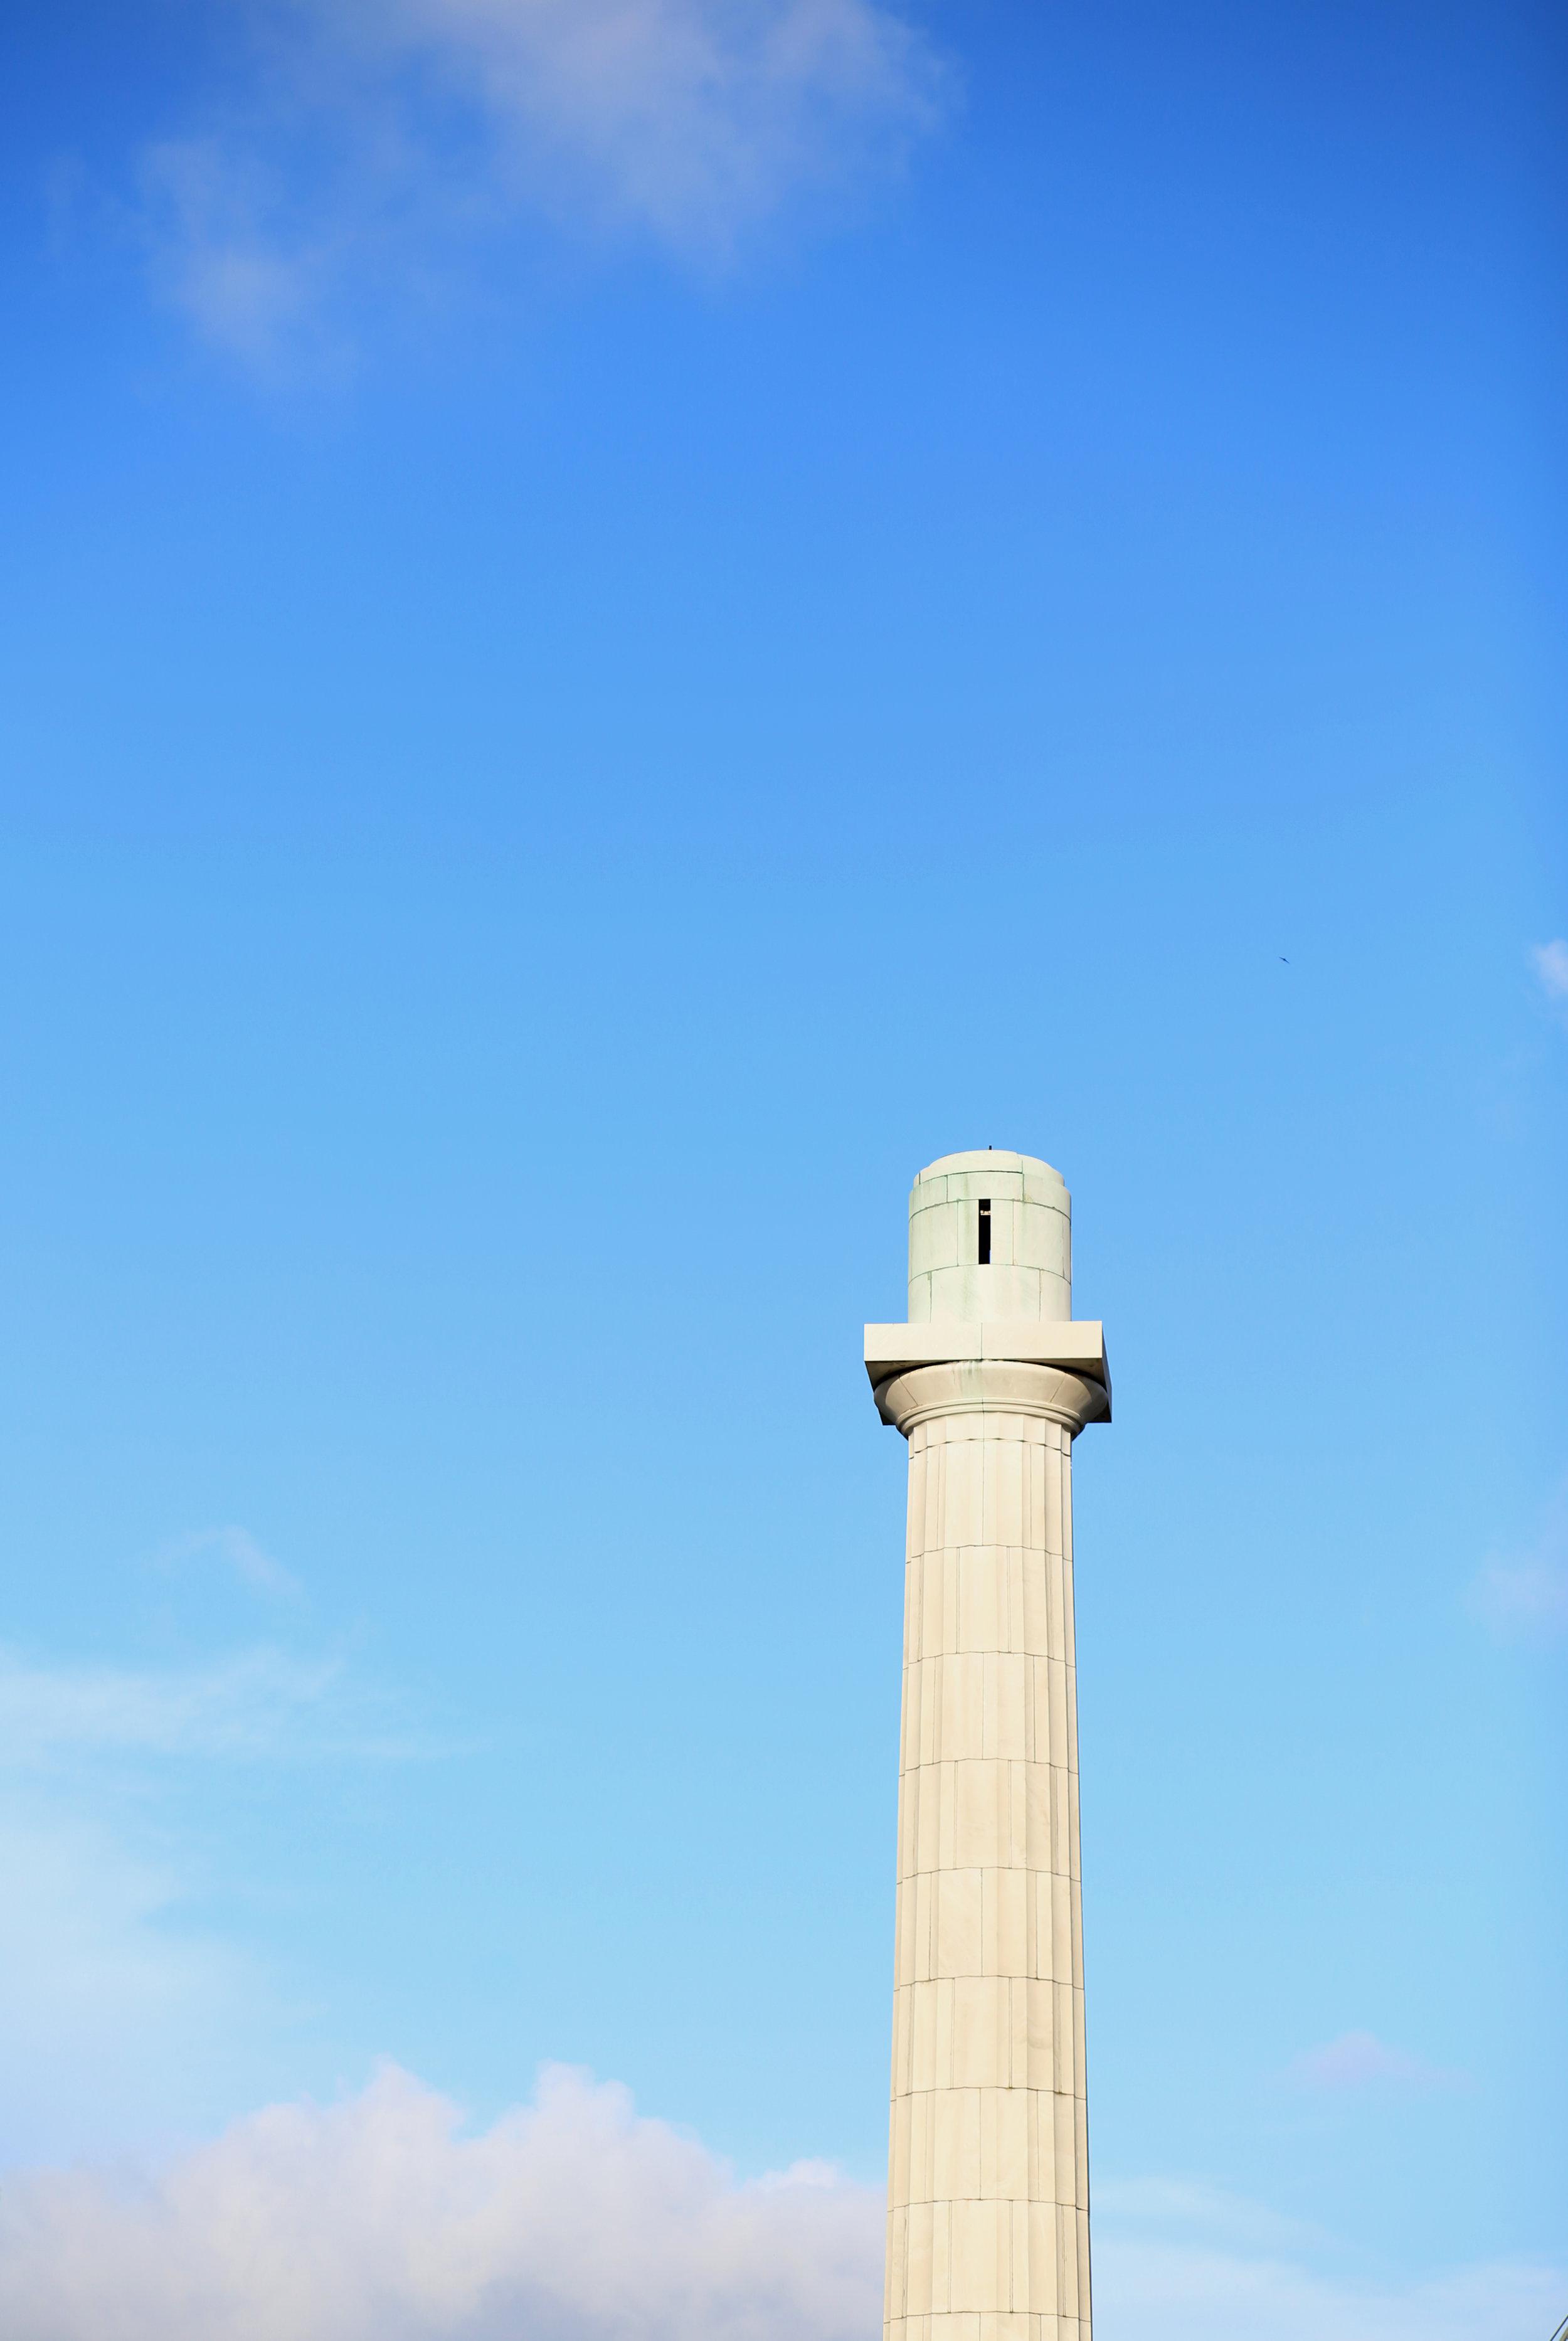 5-19-2017 Robert E. Lee Statue Removed162.JPG